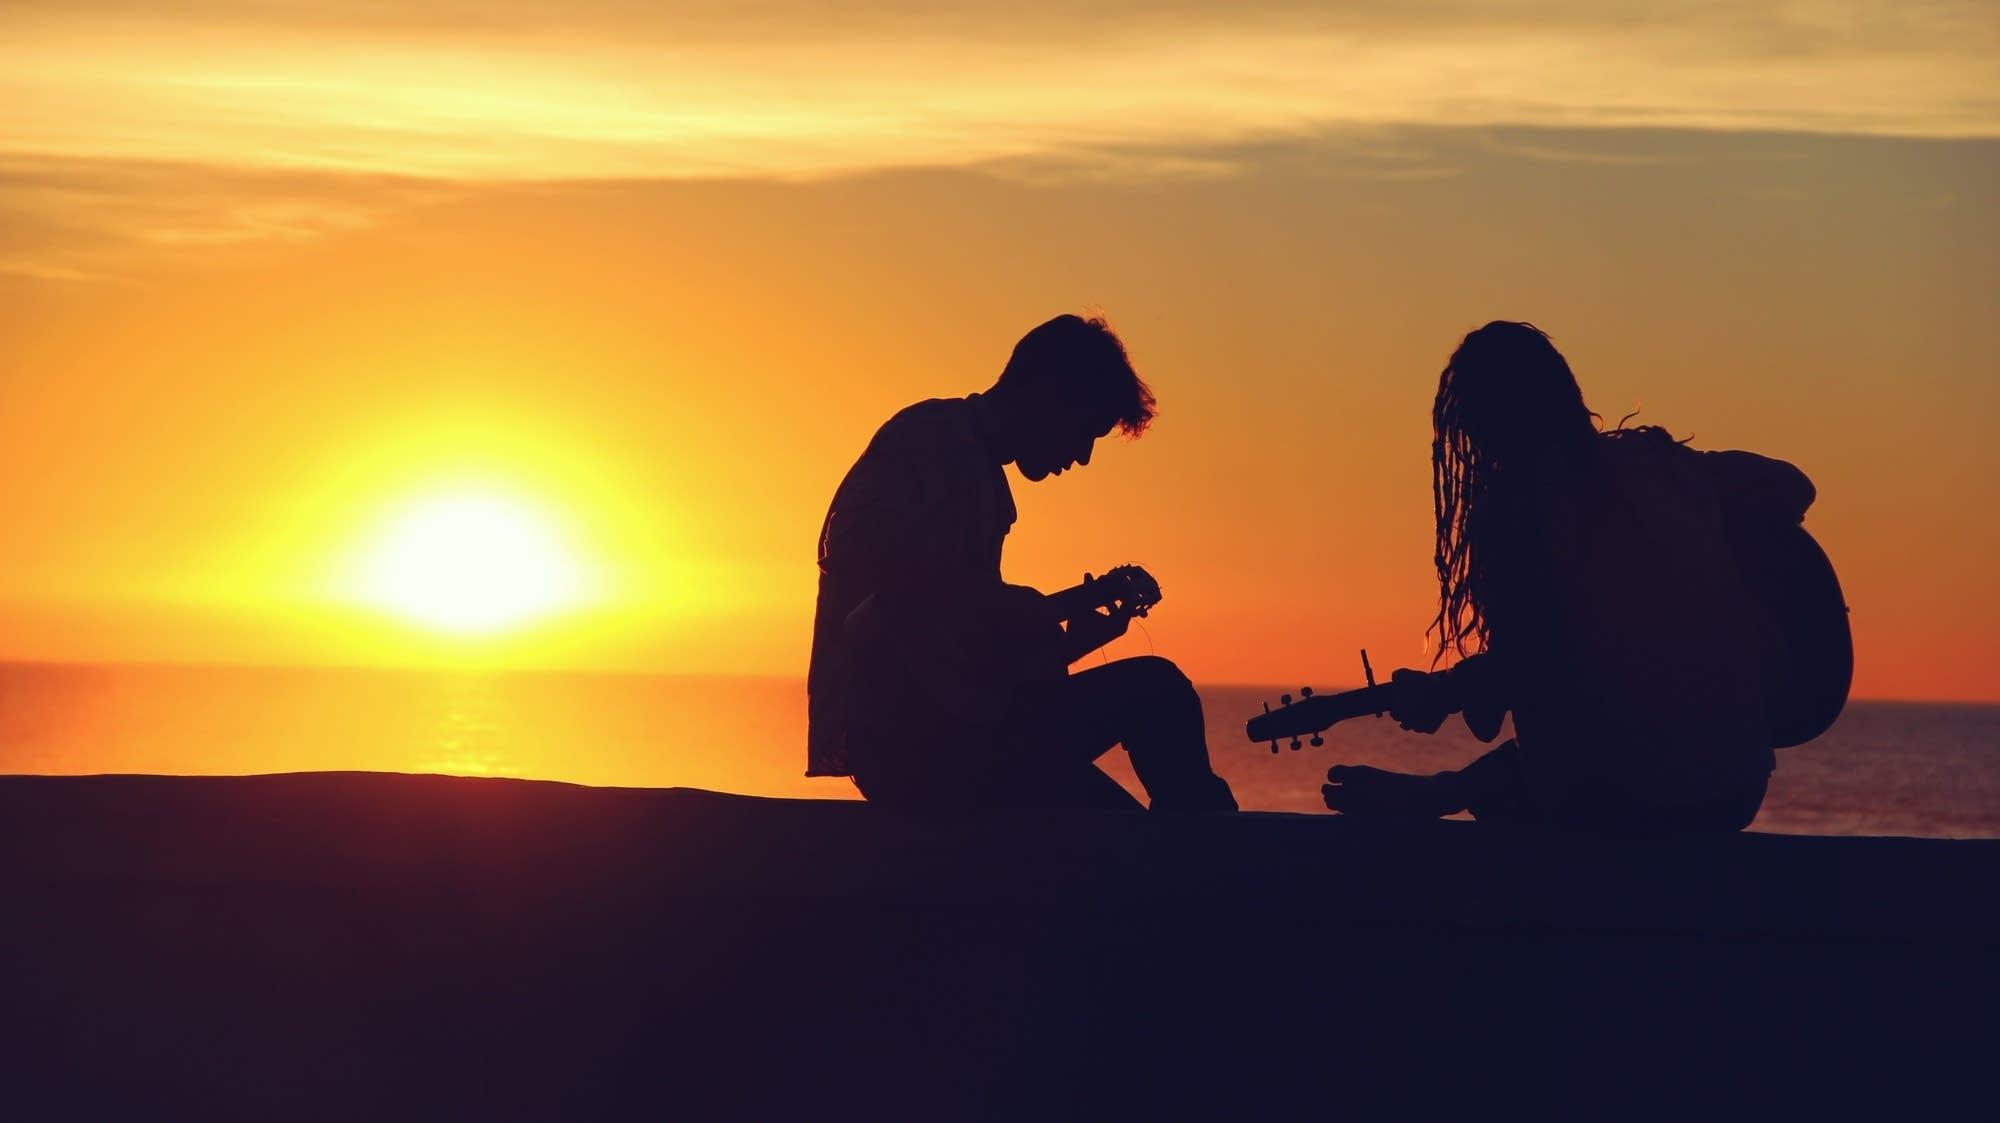 People playing guitar at sunset